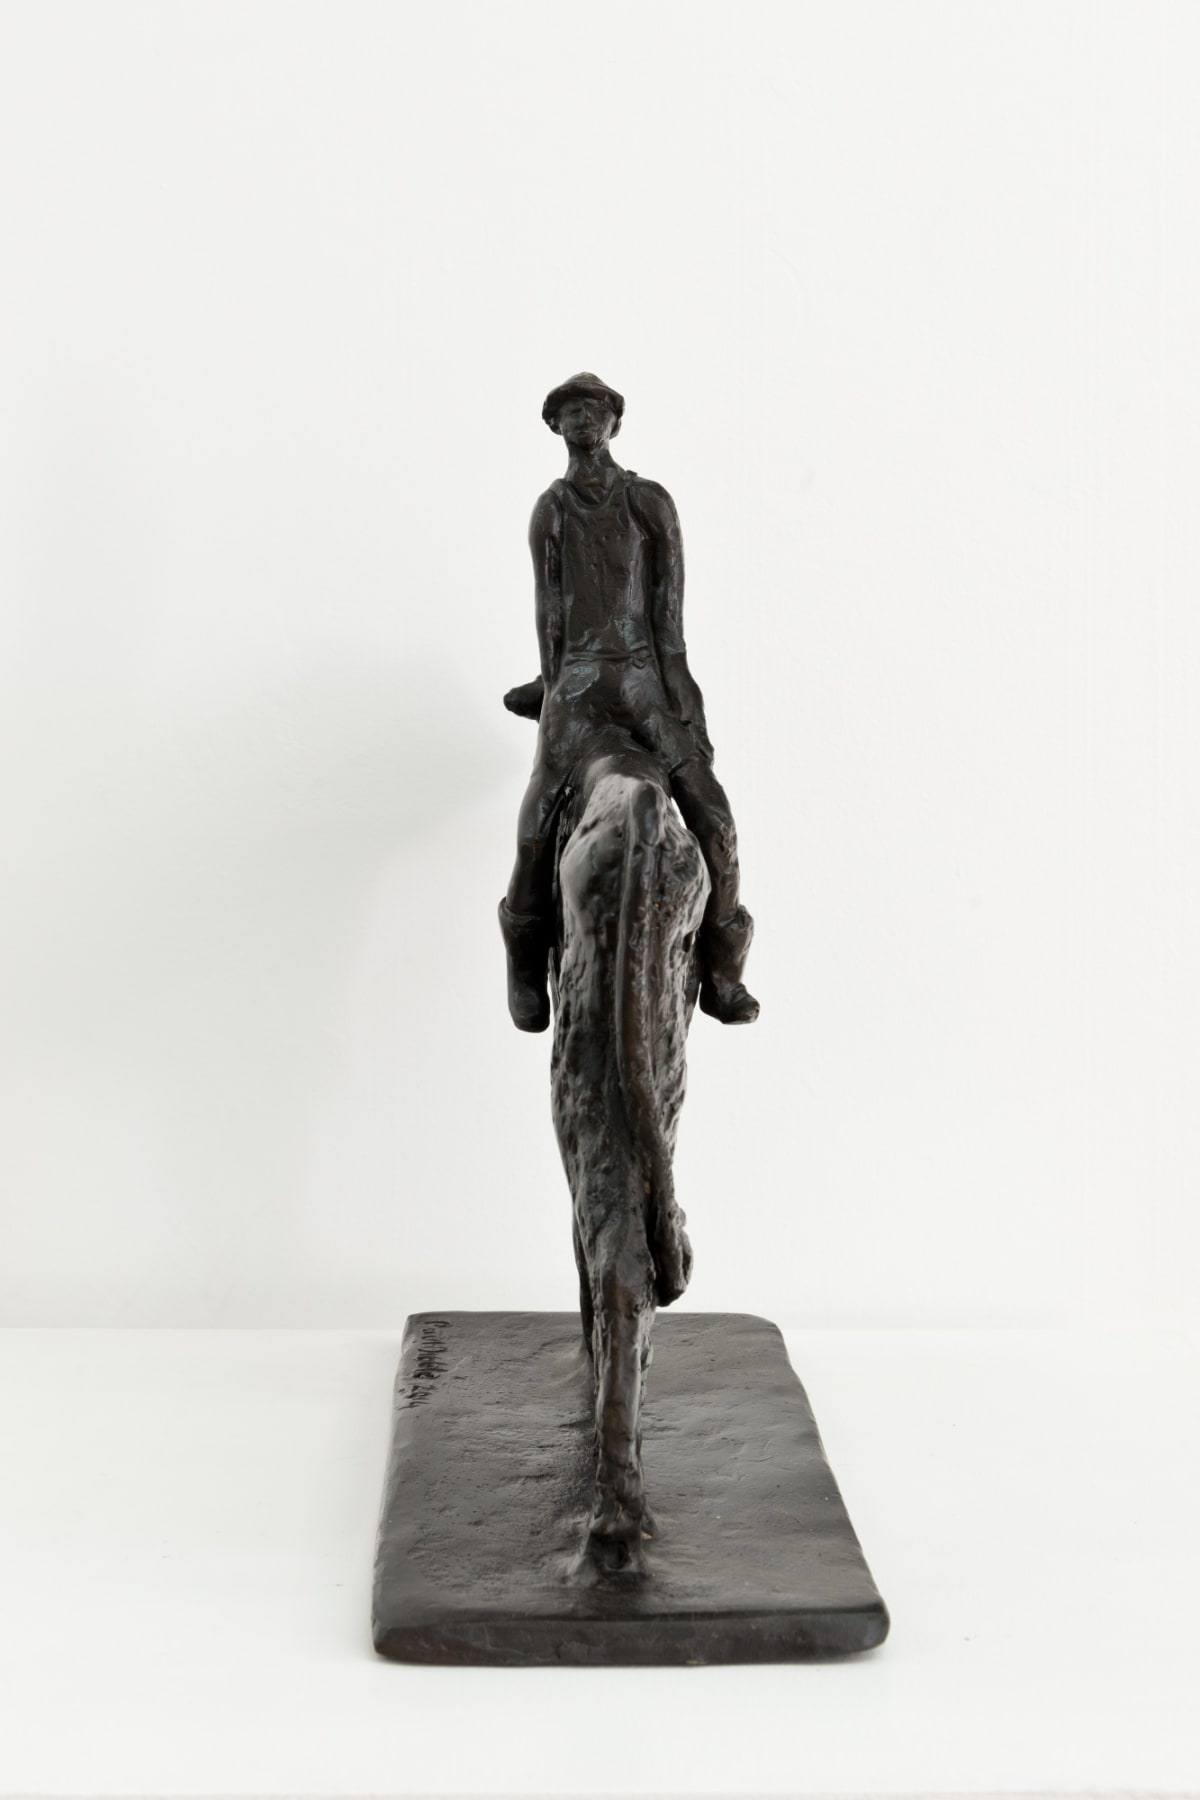 Paul DIBBLE The Farmer Looks Ahead, 2014 Cast Patinated Bronze 13.8 x 15.7 x 5.5 in 35 x 40 x 14 cm #1/2